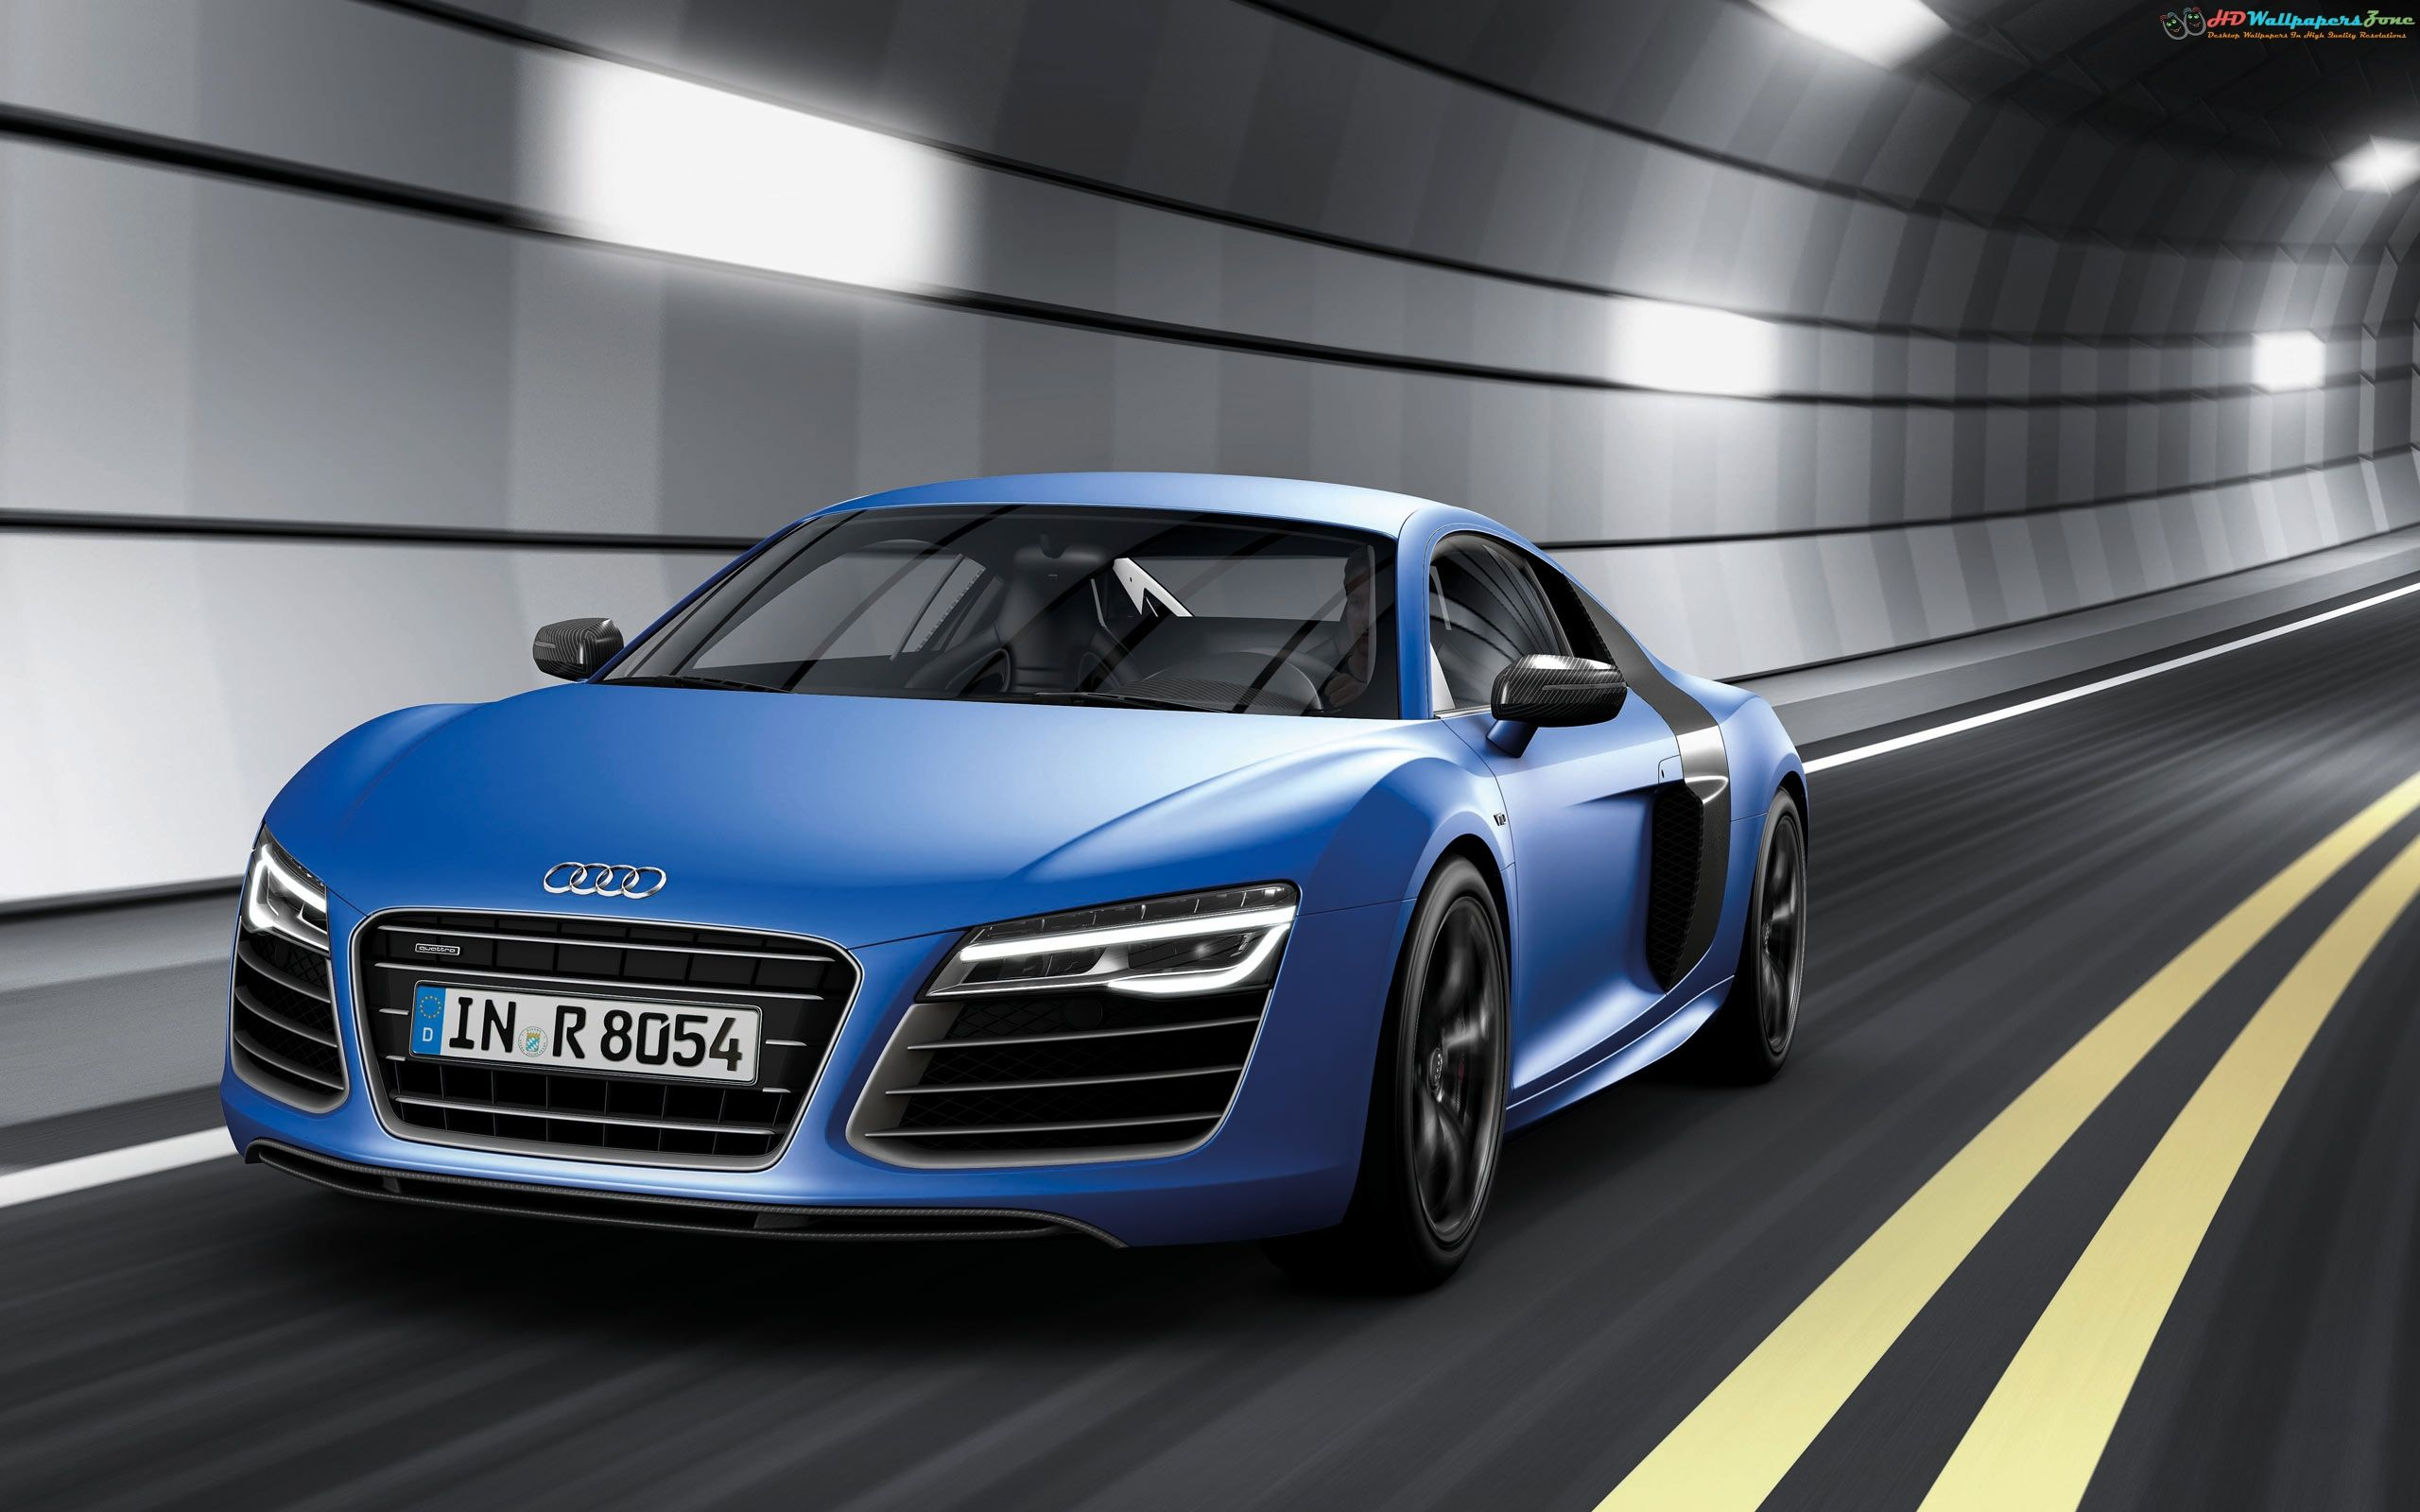 Audi r8 1509 hd desktop car wallpaper in hd and widescreen resolutions http